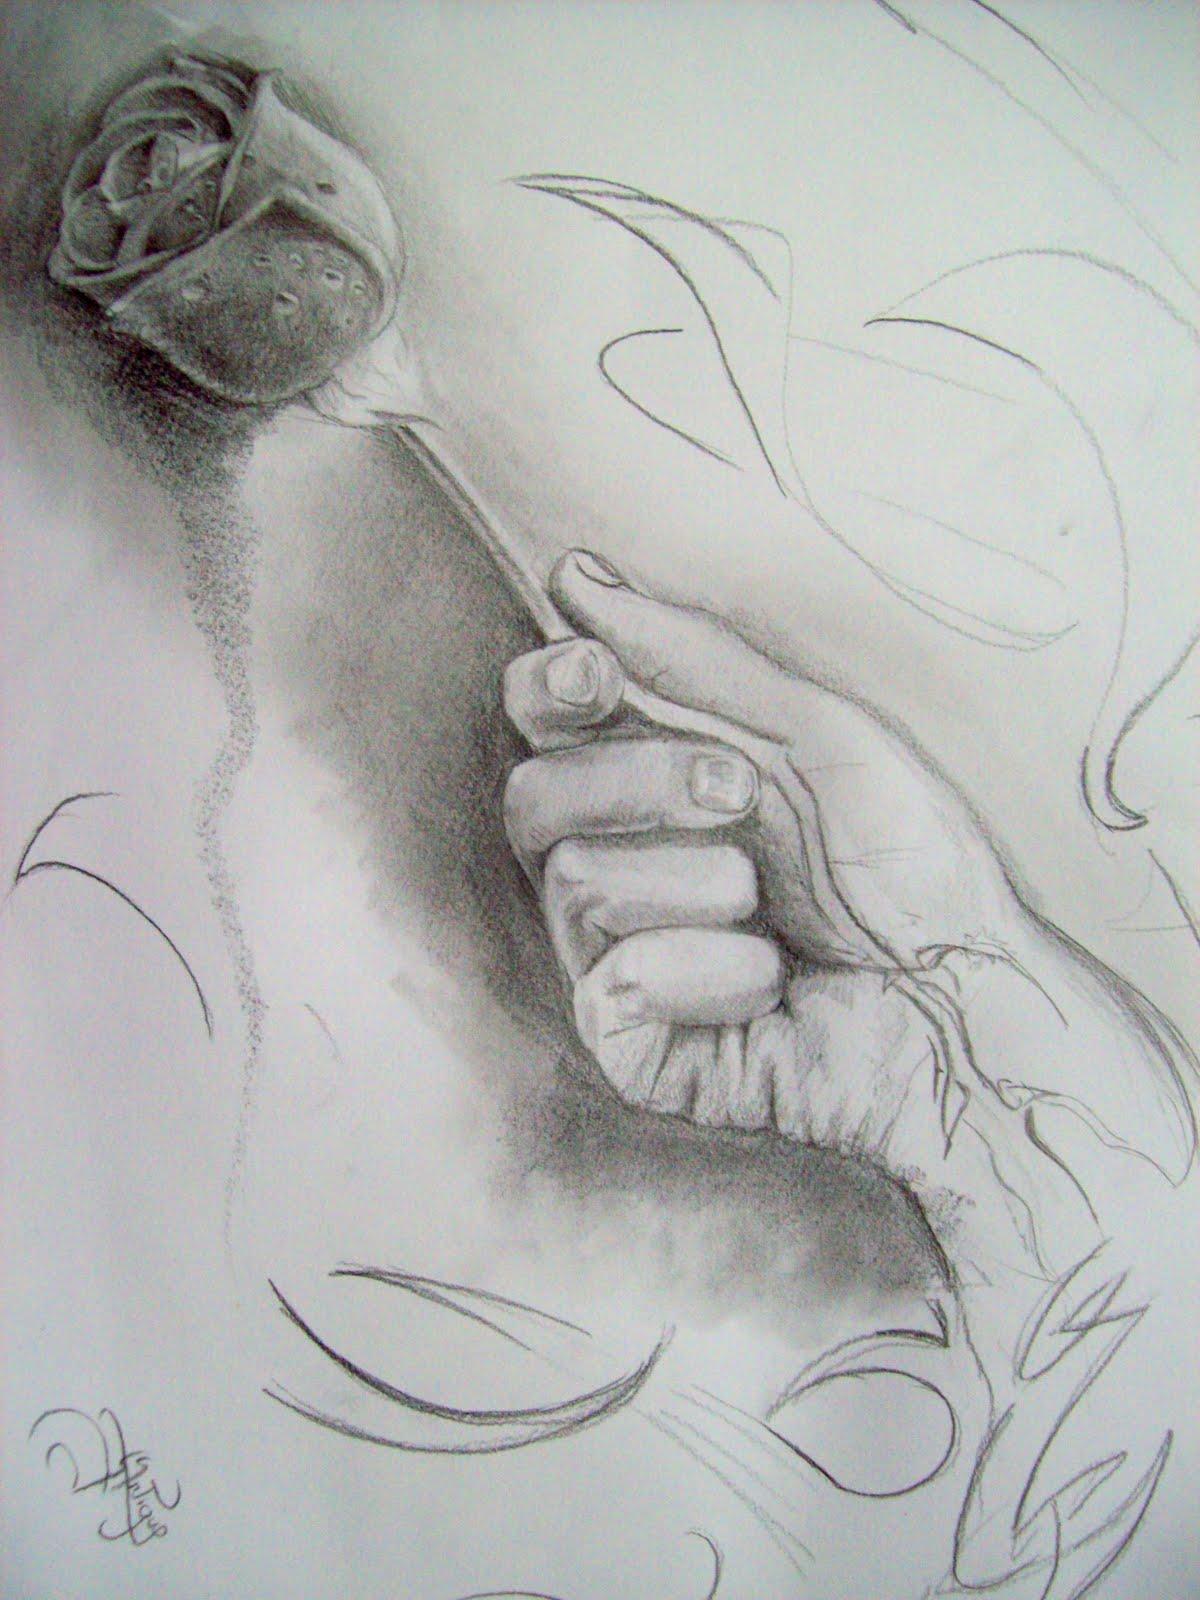 Imagenes hechos a lapiz de amor - Imagui